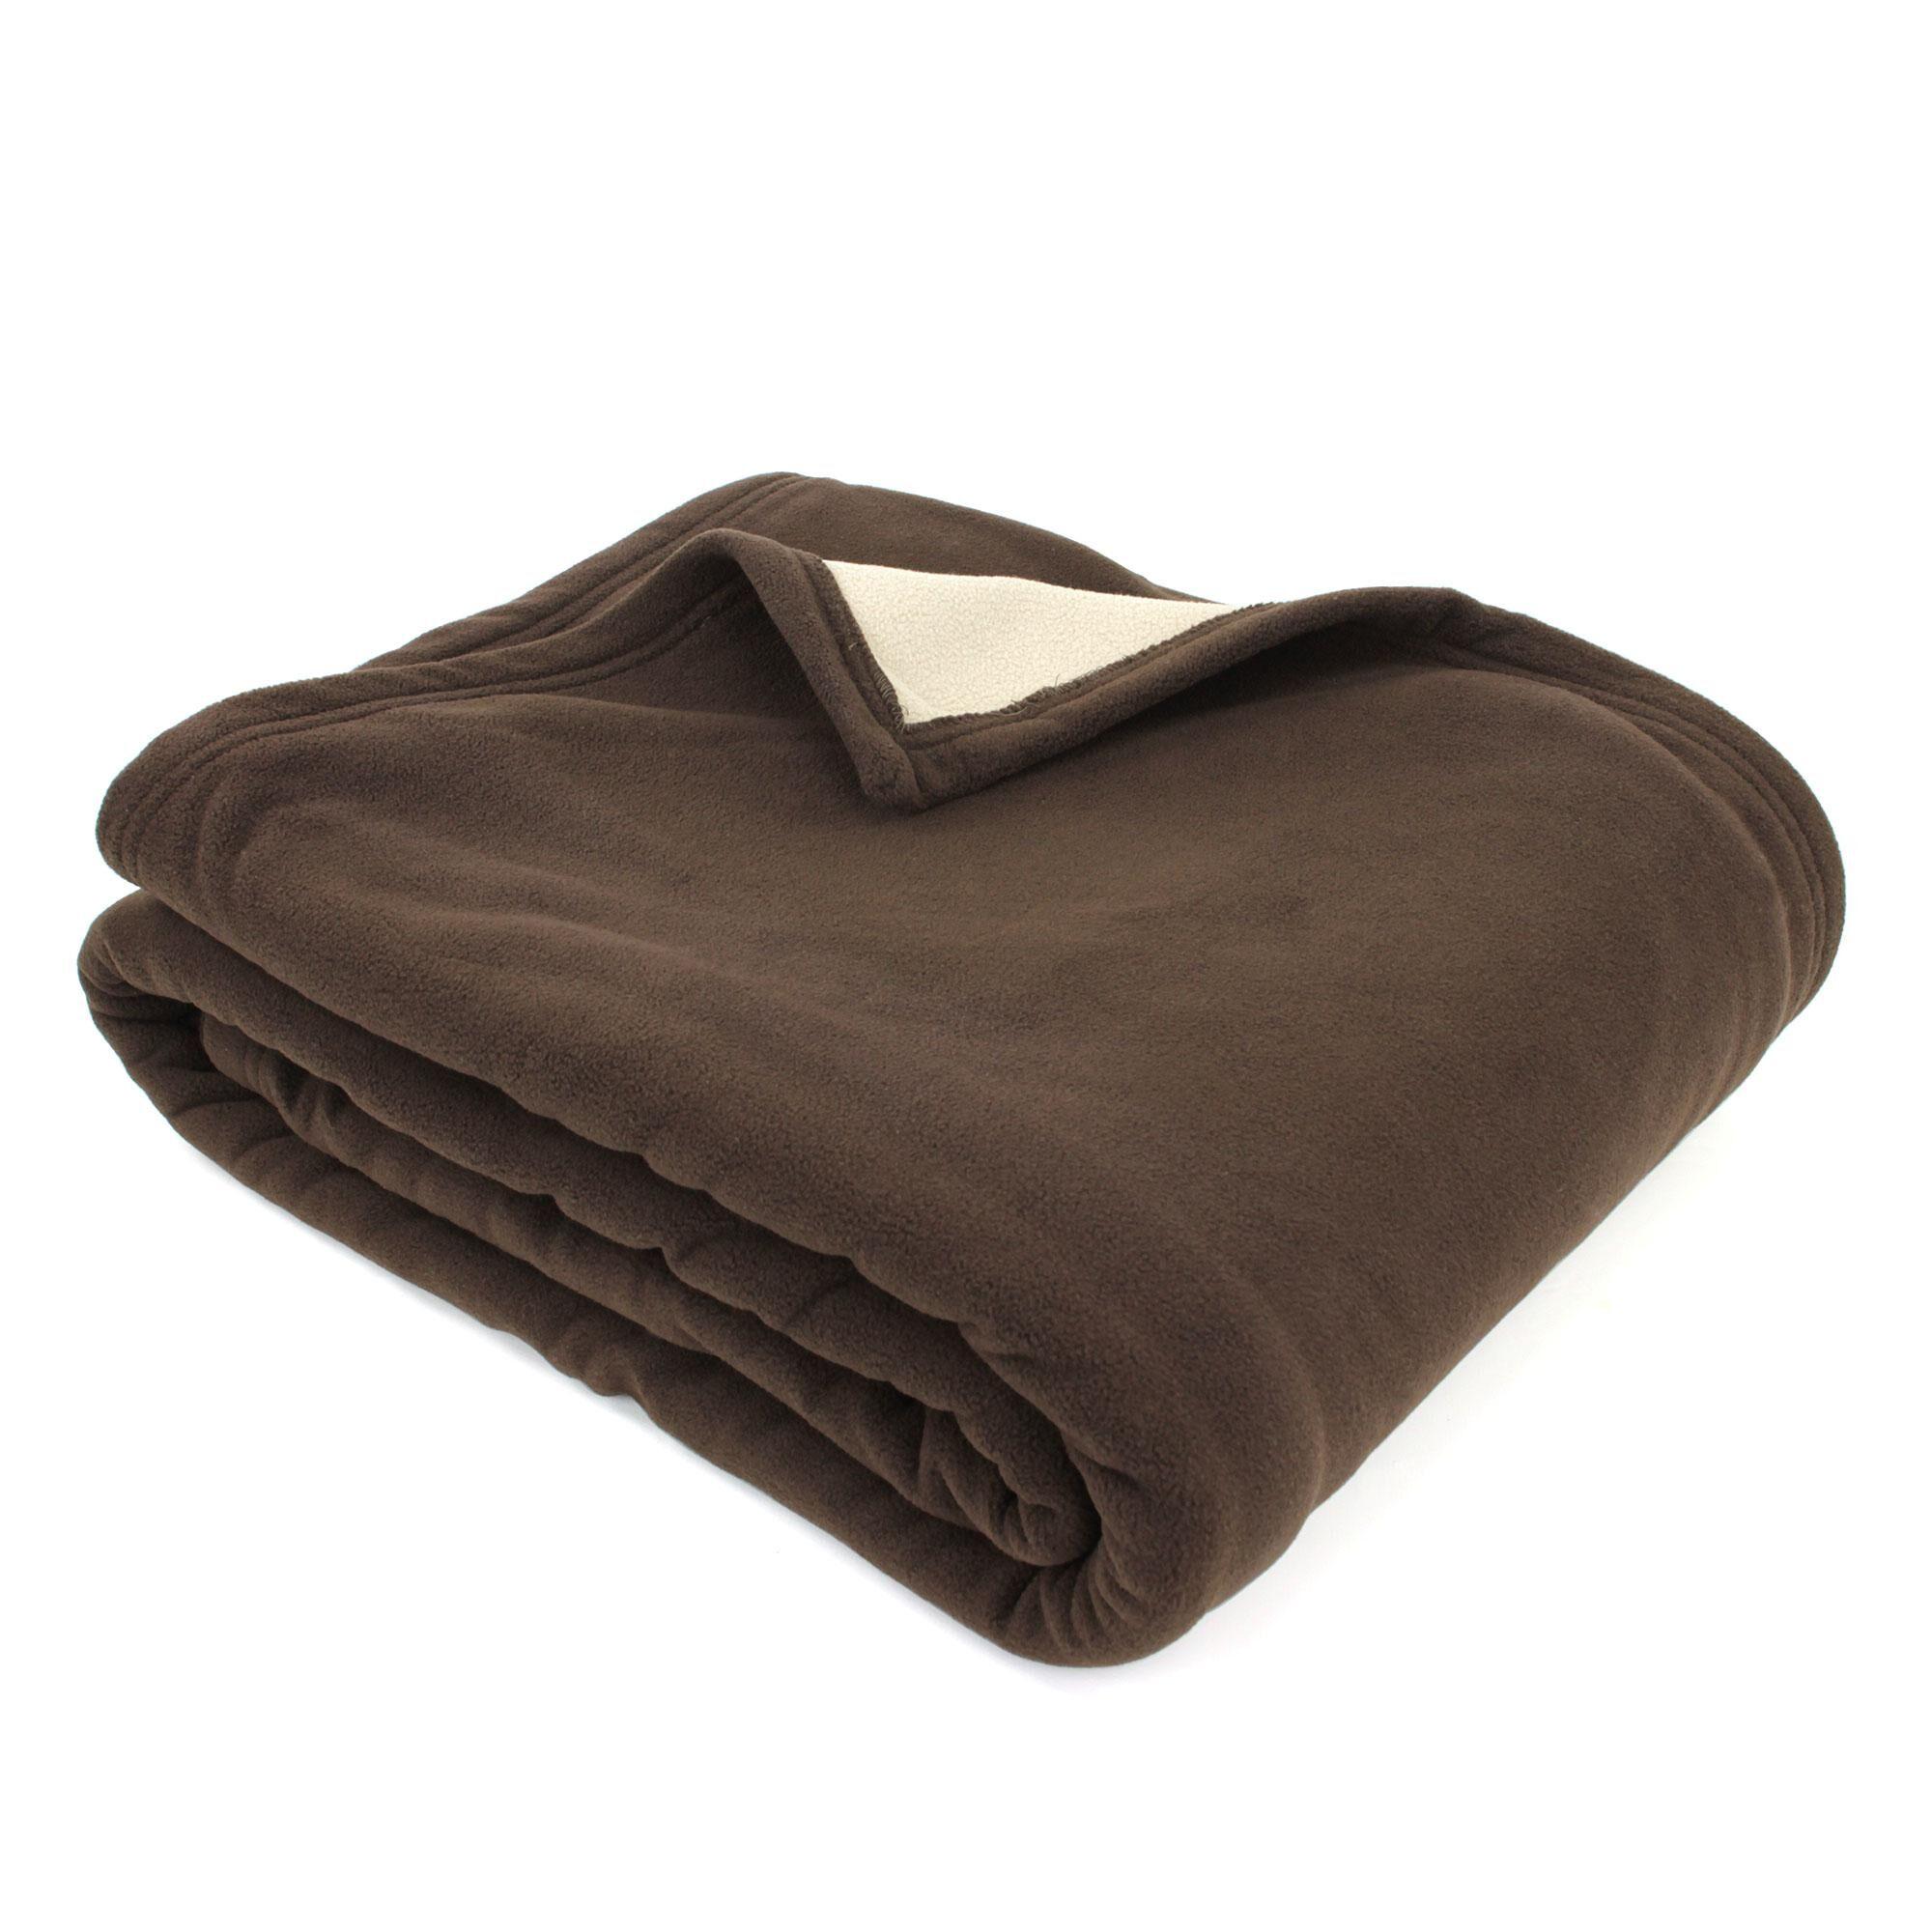 Linnea Couverture polaire luxe 240x260 cm 100% polyester 430 g/m2 NARVIK Marron Chocolat